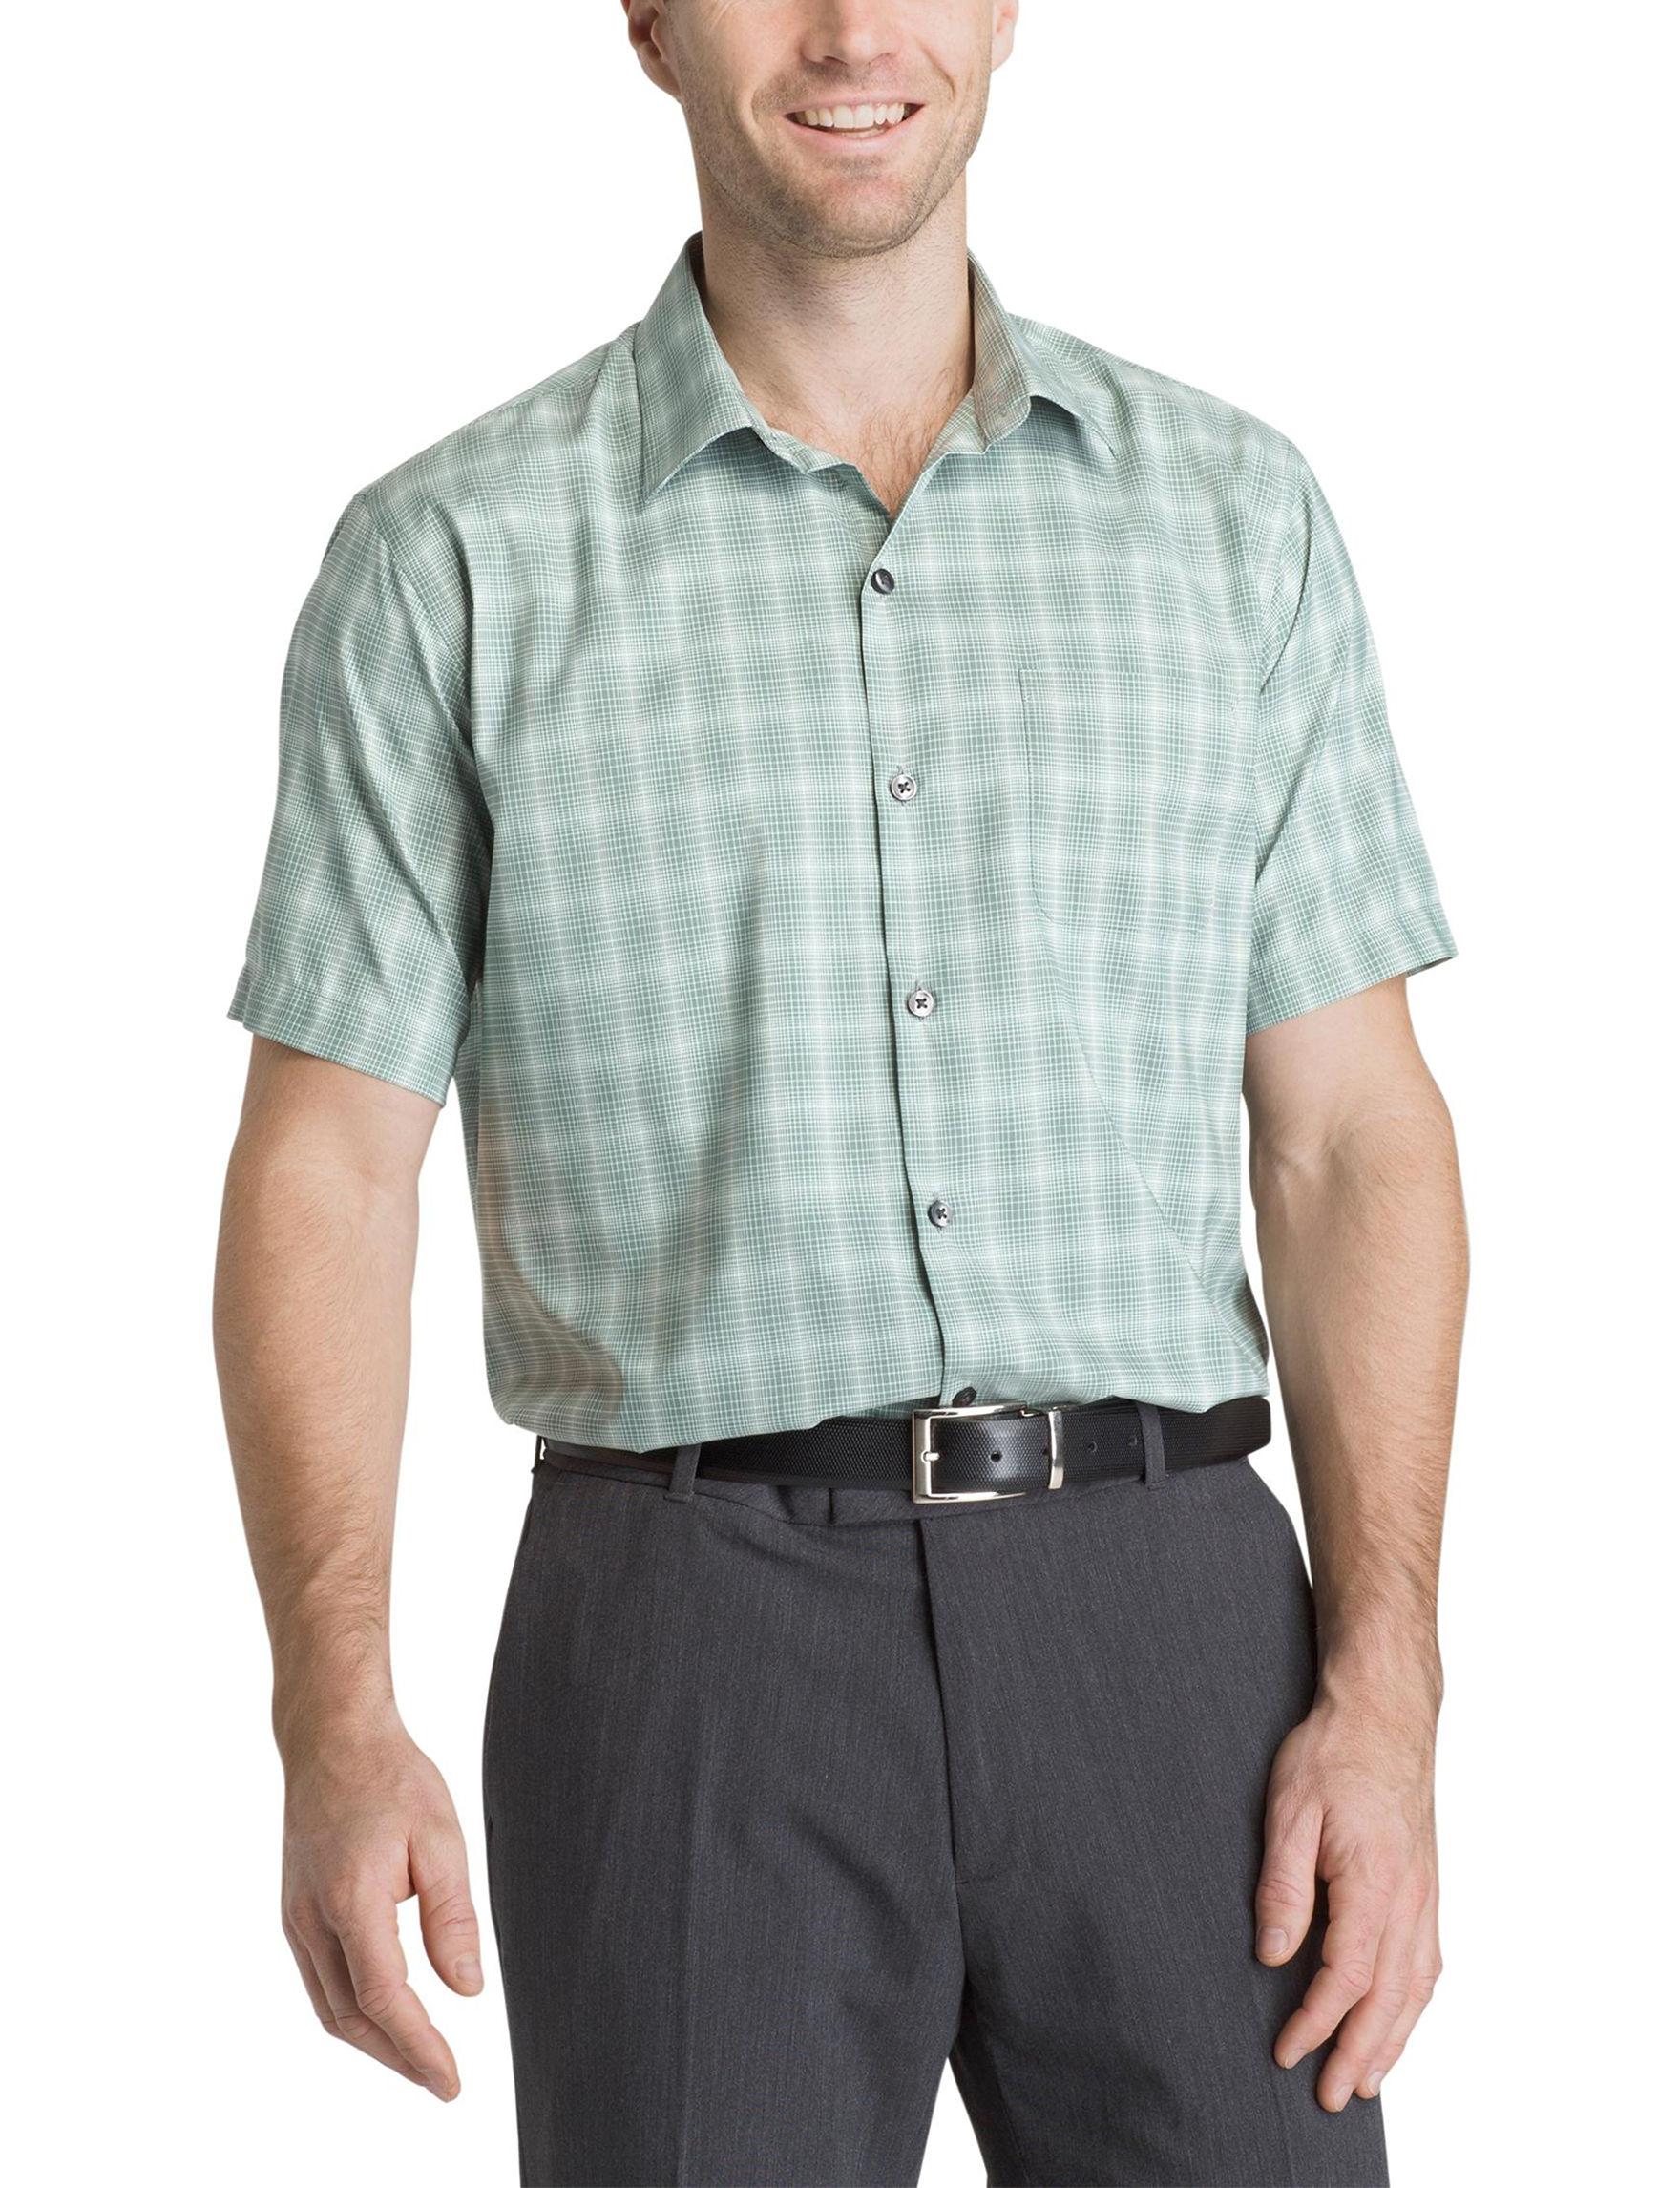 Van Heusen Green Casual Button Down Shirts